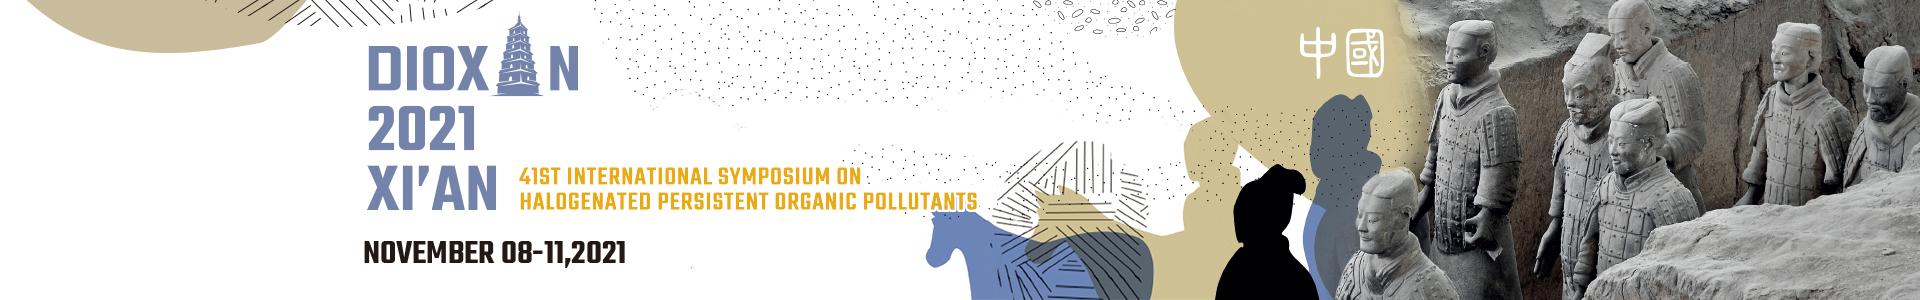 41st International Symposium on Halogenated Persistent Organic Pollutants